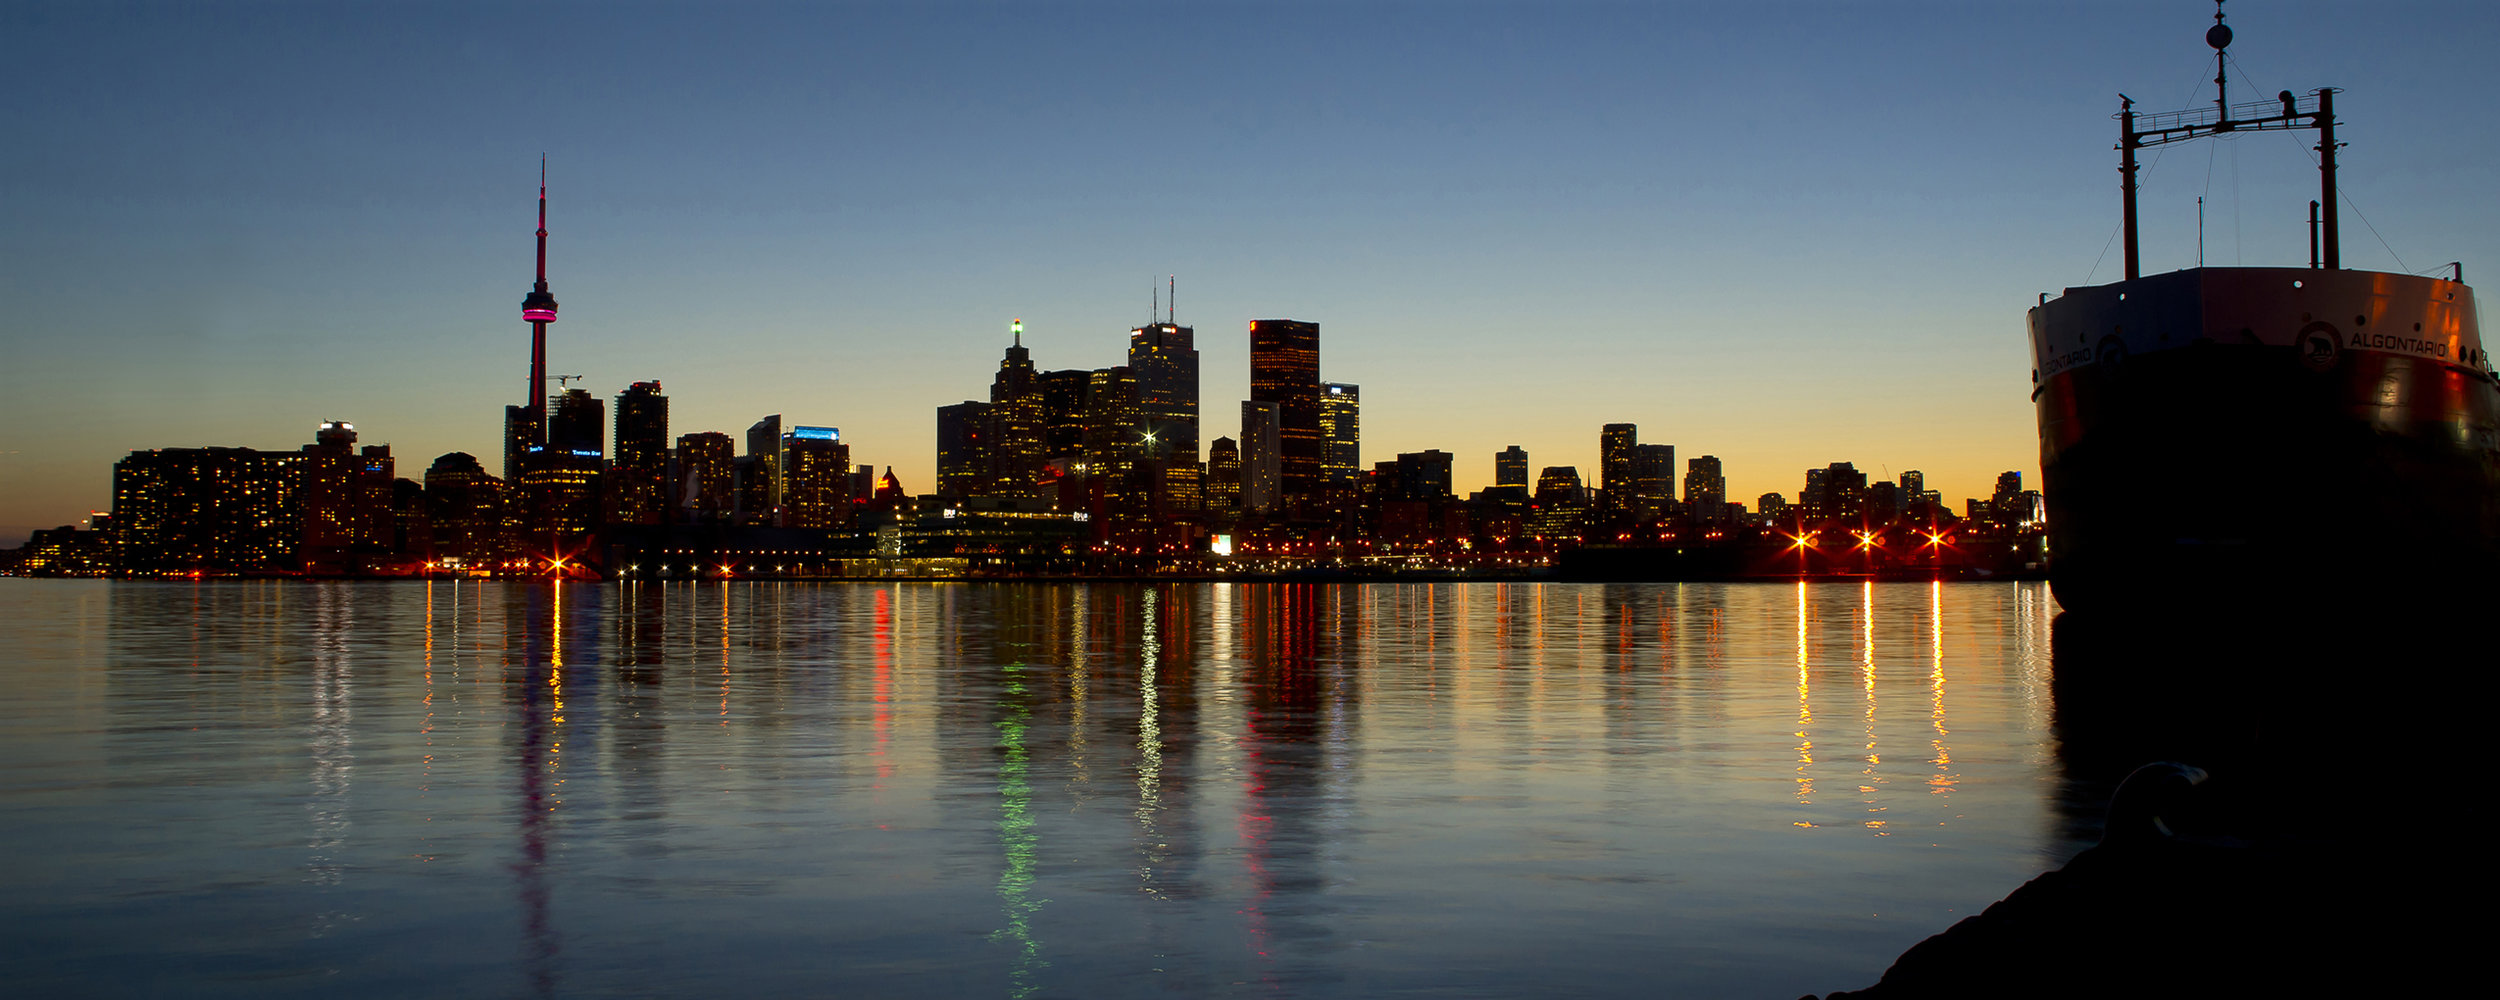 City Glow at Sunset final 20.jpg